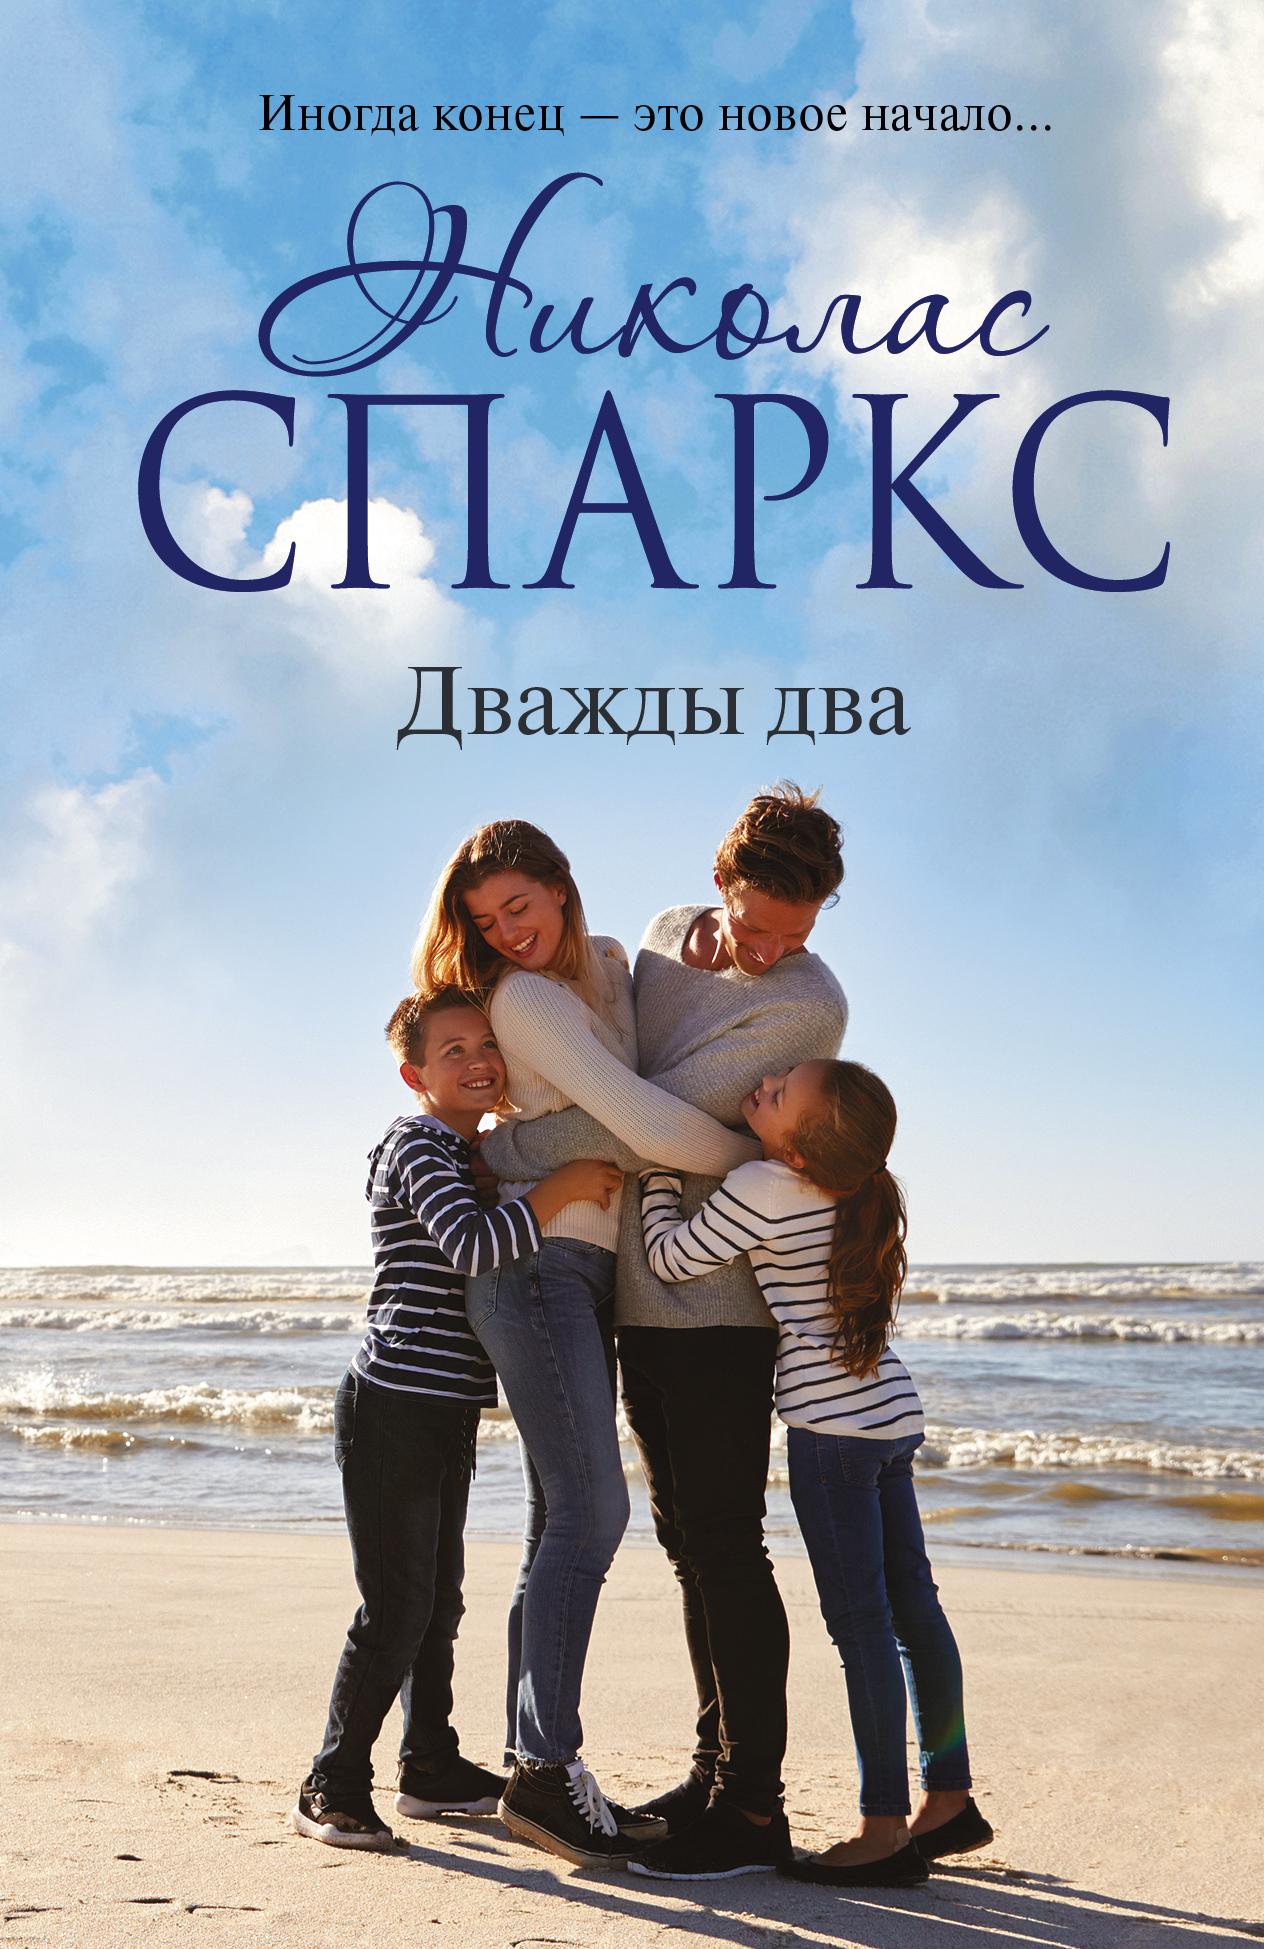 Спаркс Н. Дважды два ISBN: 978-5-17-109442-3